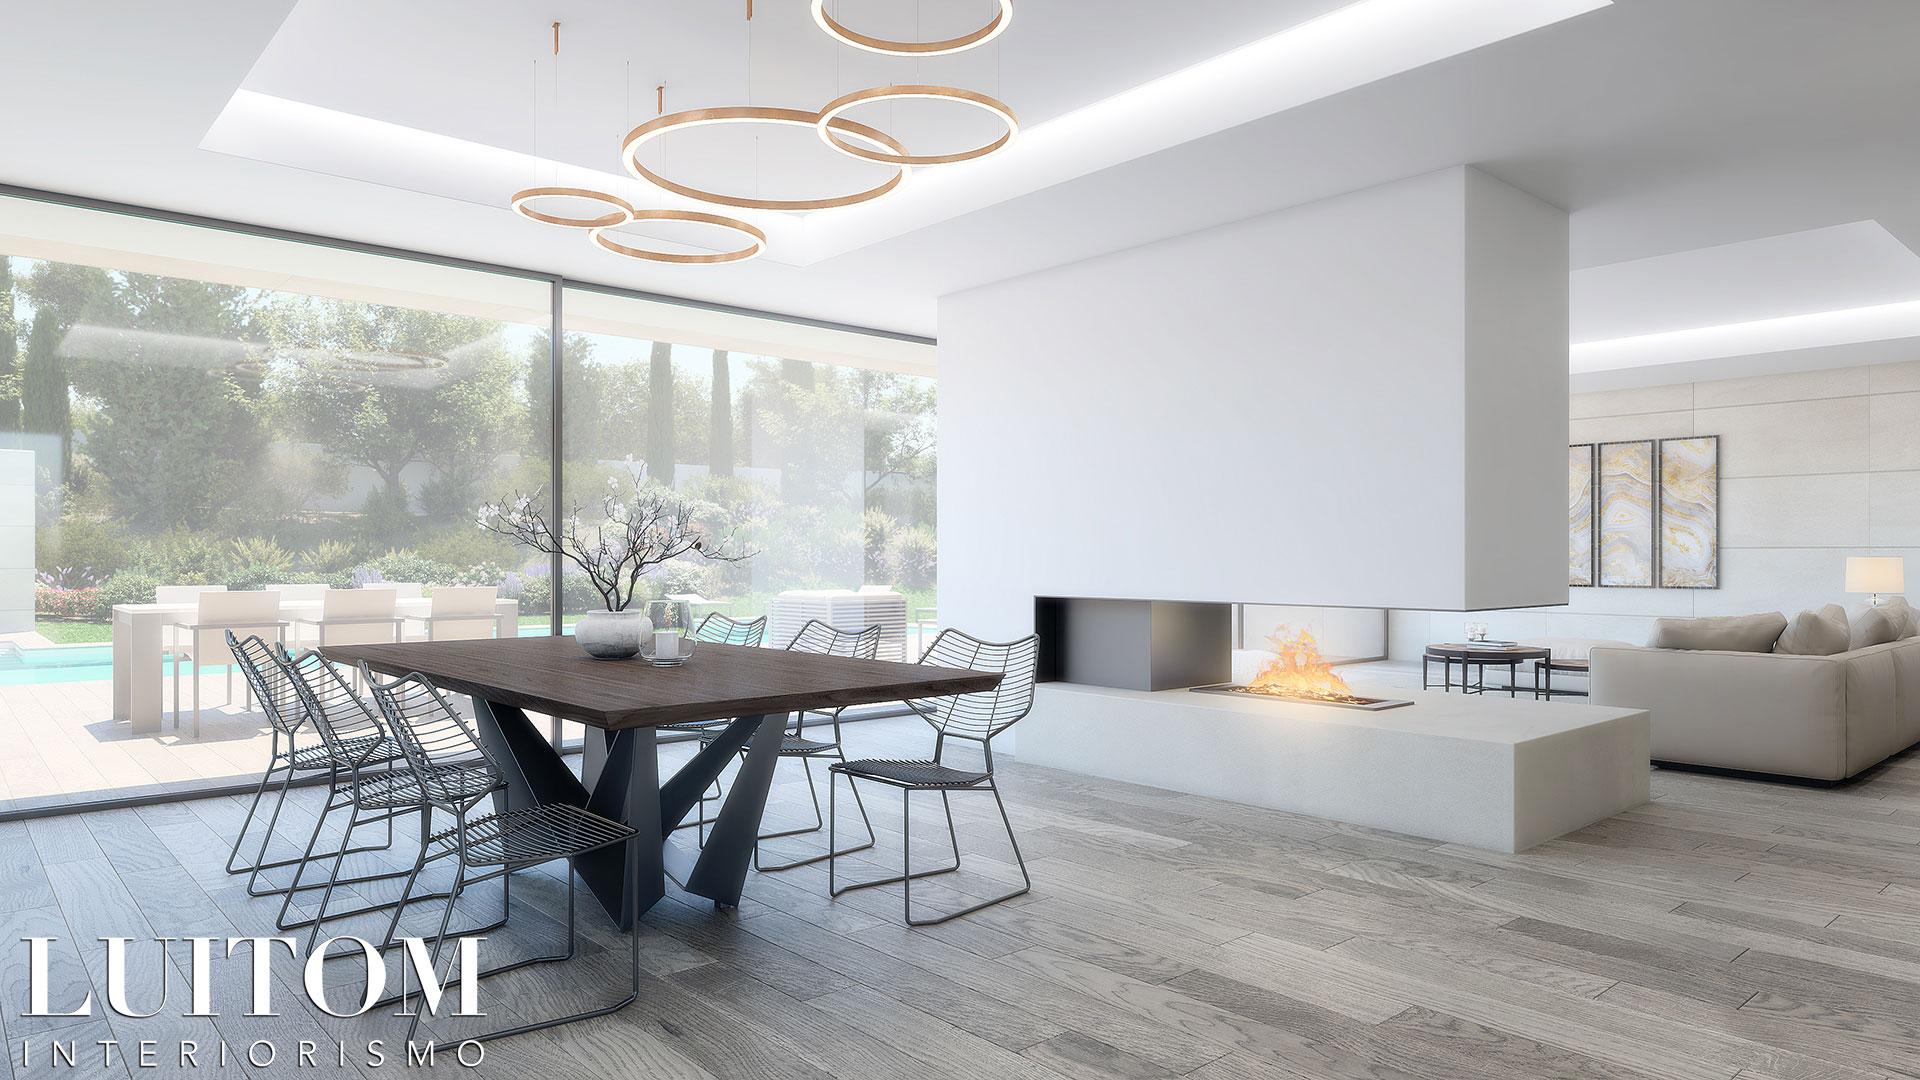 ideas-reformas-casas-lujo-interiorismo-decoracion-viviendas-luxury-home-living-kitchen-interior-design-48